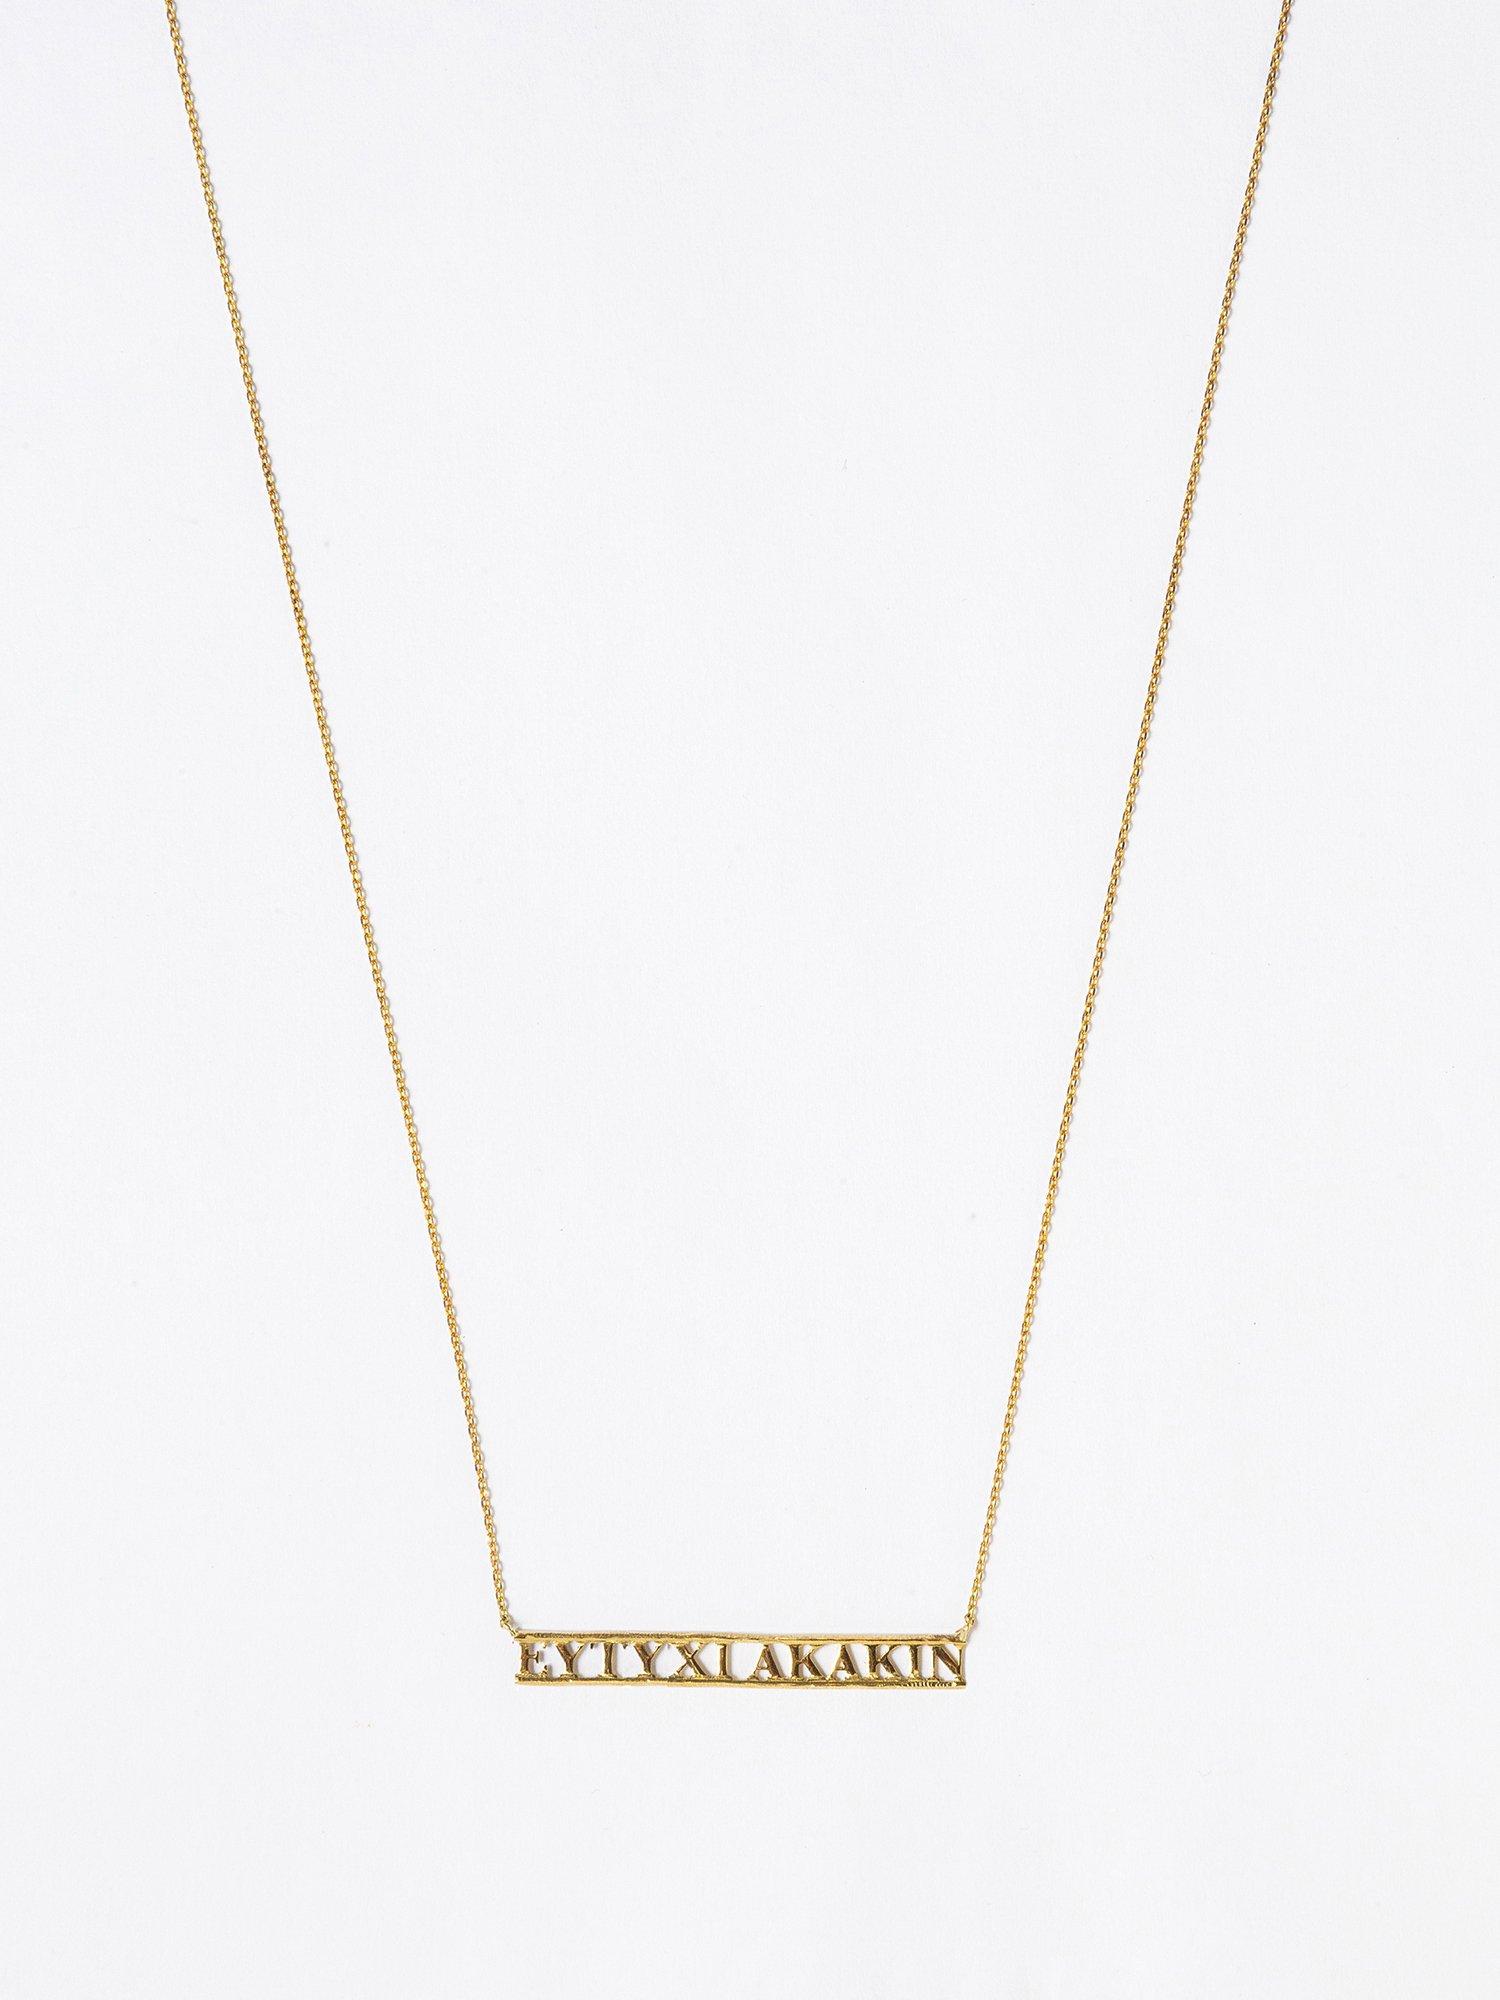 AMOUR / Inscription necklace / EYTYXI AKAKIN